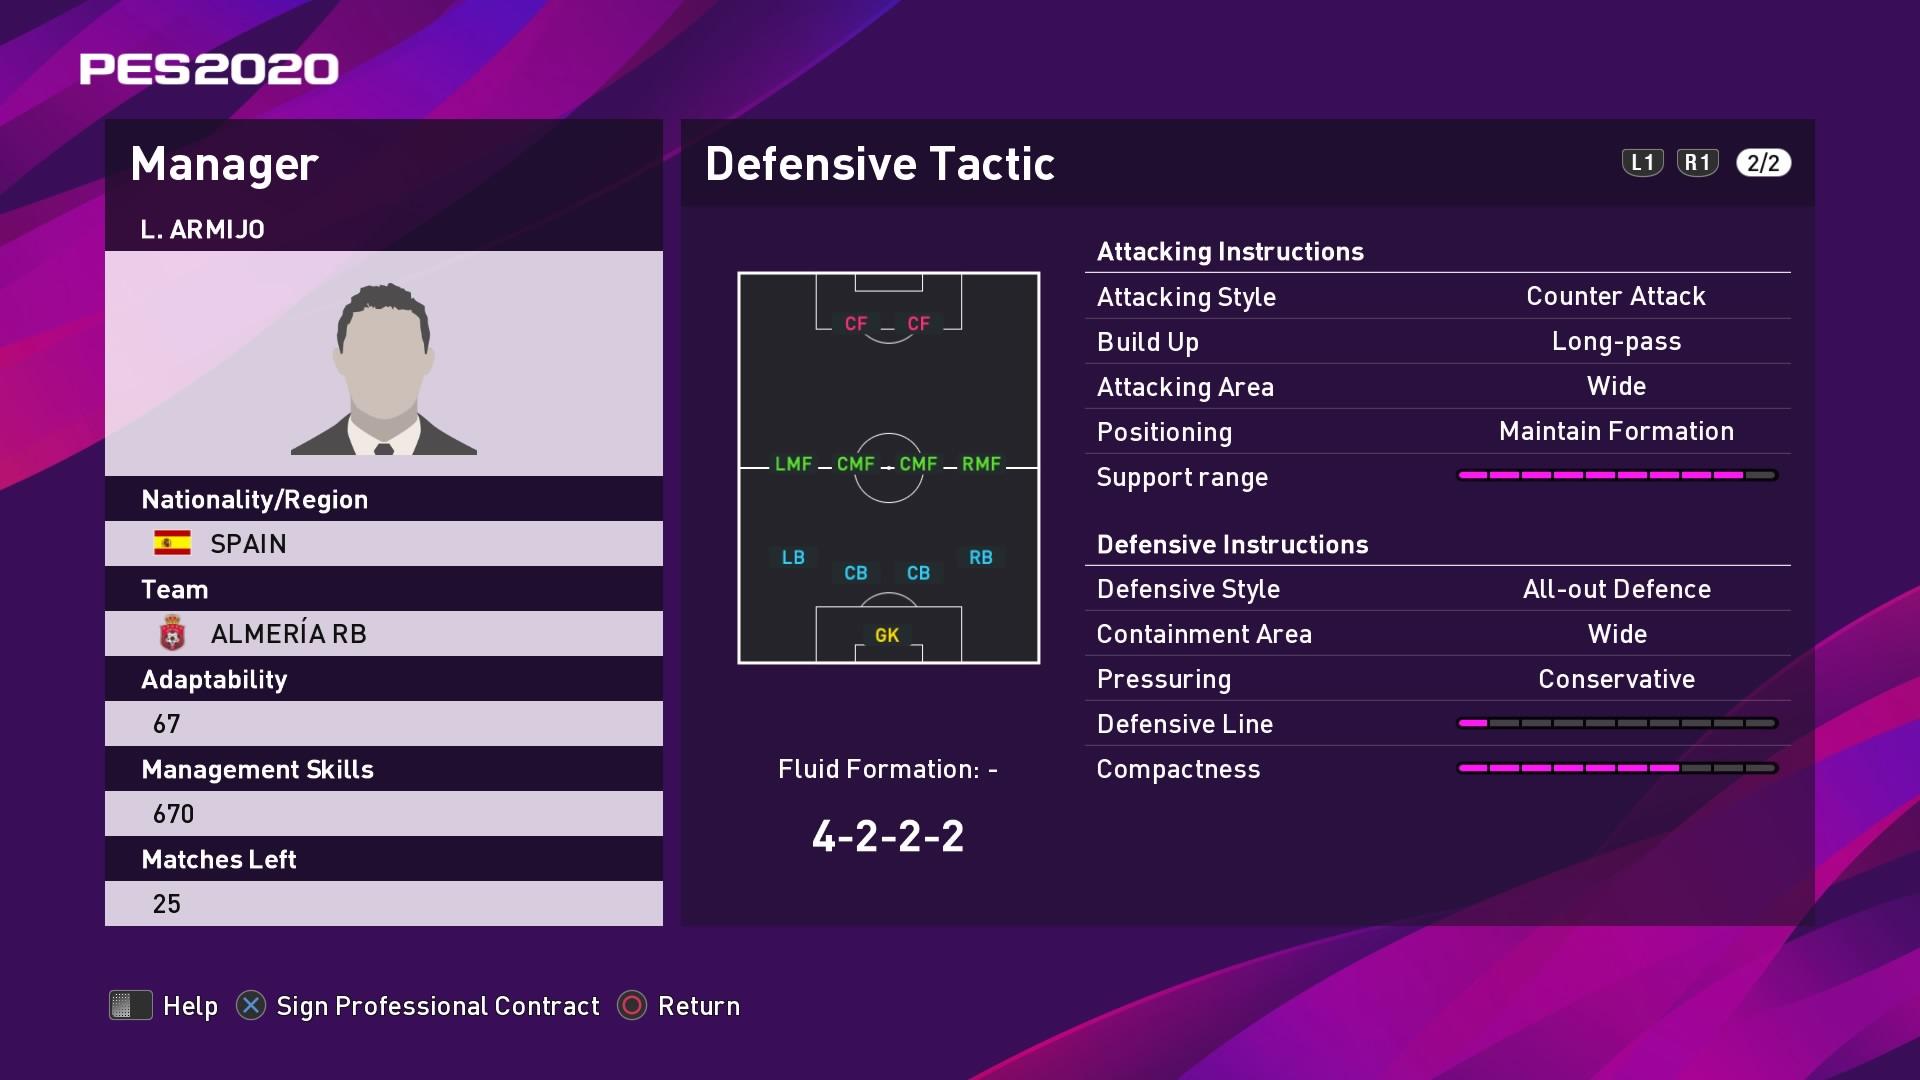 L. Armijo (Guti) Defensive Tactic in PES 2020 myClub